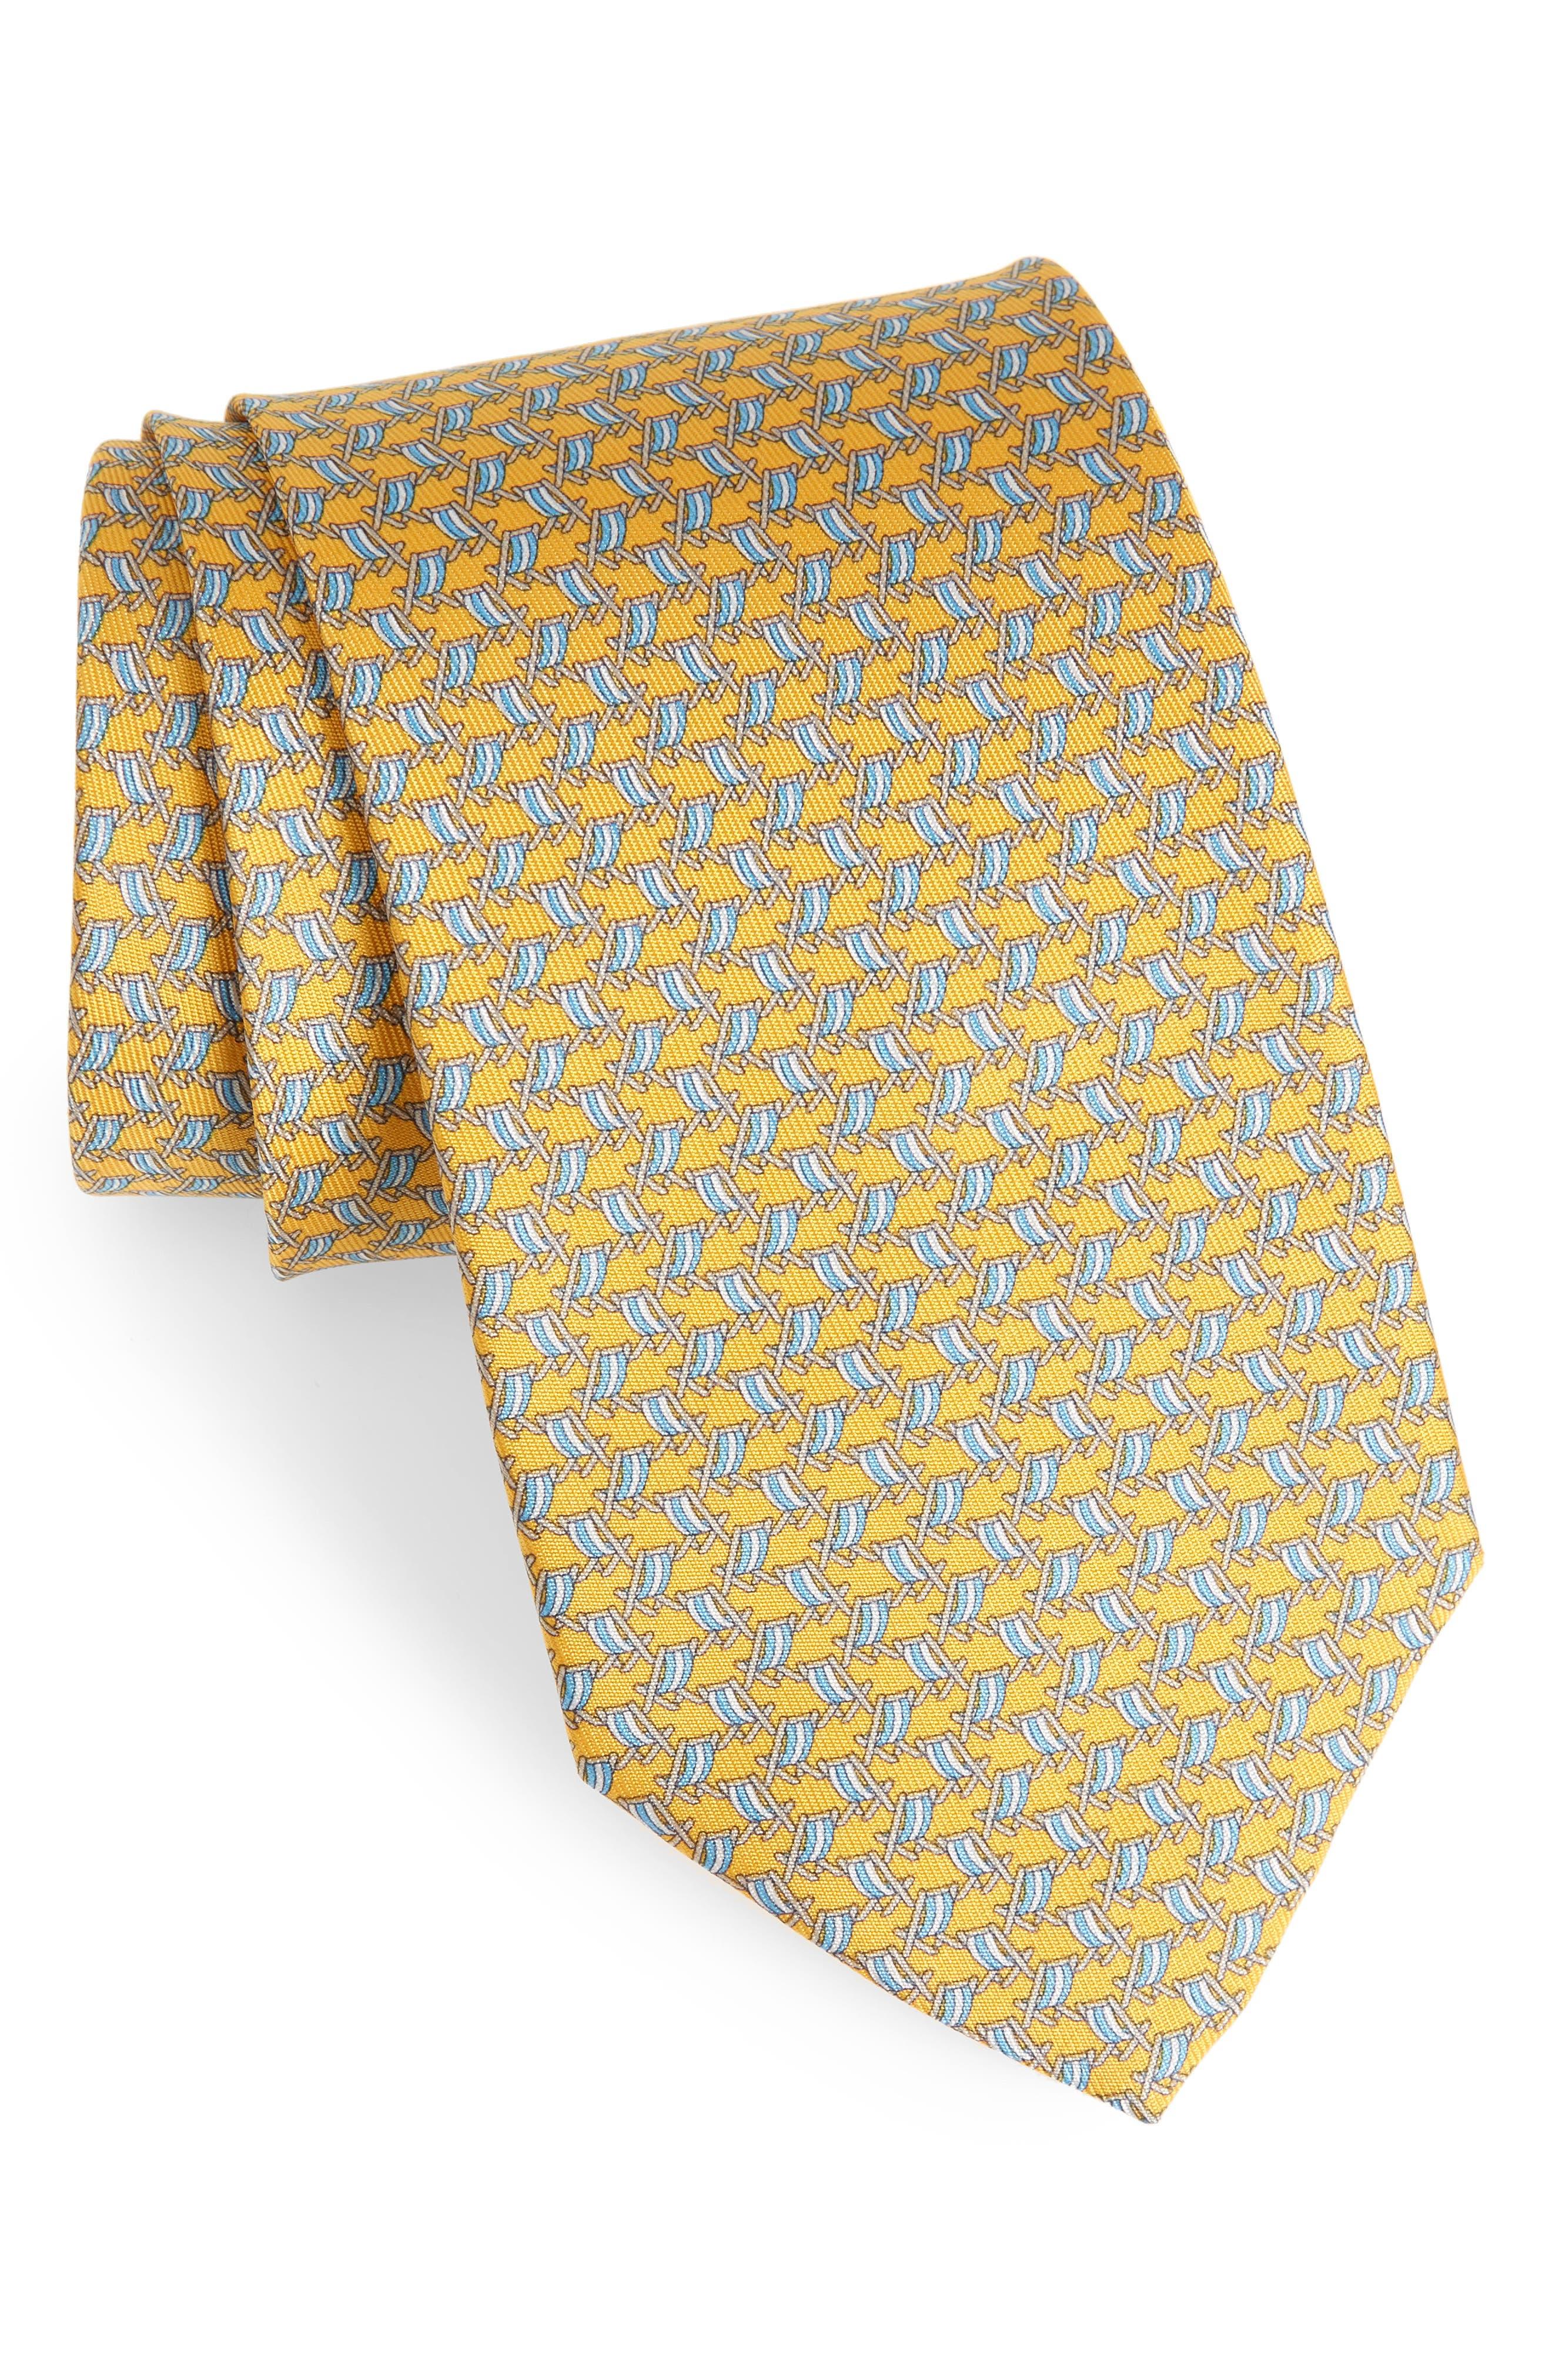 Ersilia Print Silk Tie,                             Main thumbnail 1, color,                             Yellow